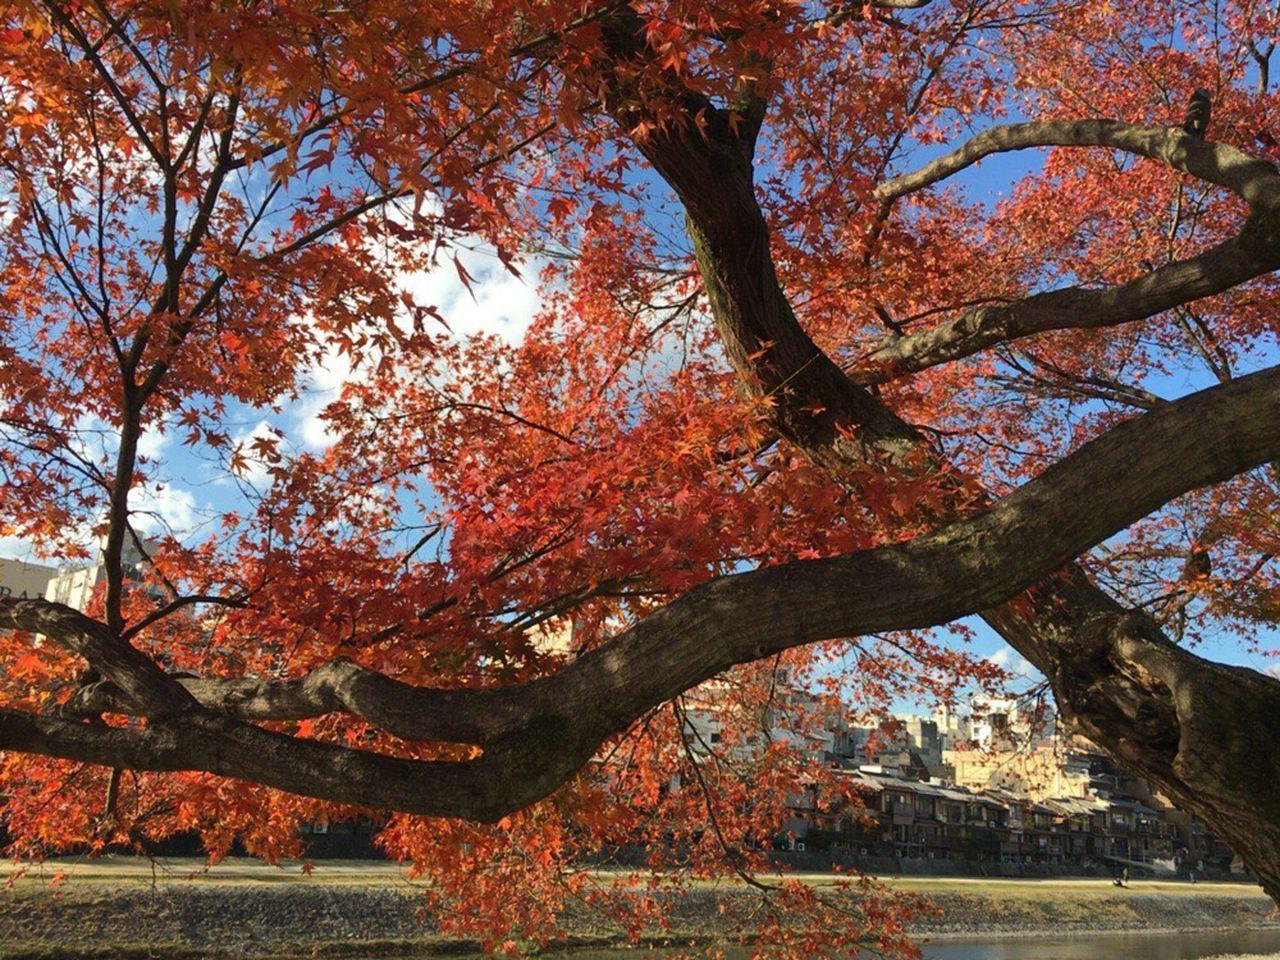 Kyoto Autumn Leafs Kyoto Japan Kyoto Autumn Kyoto City